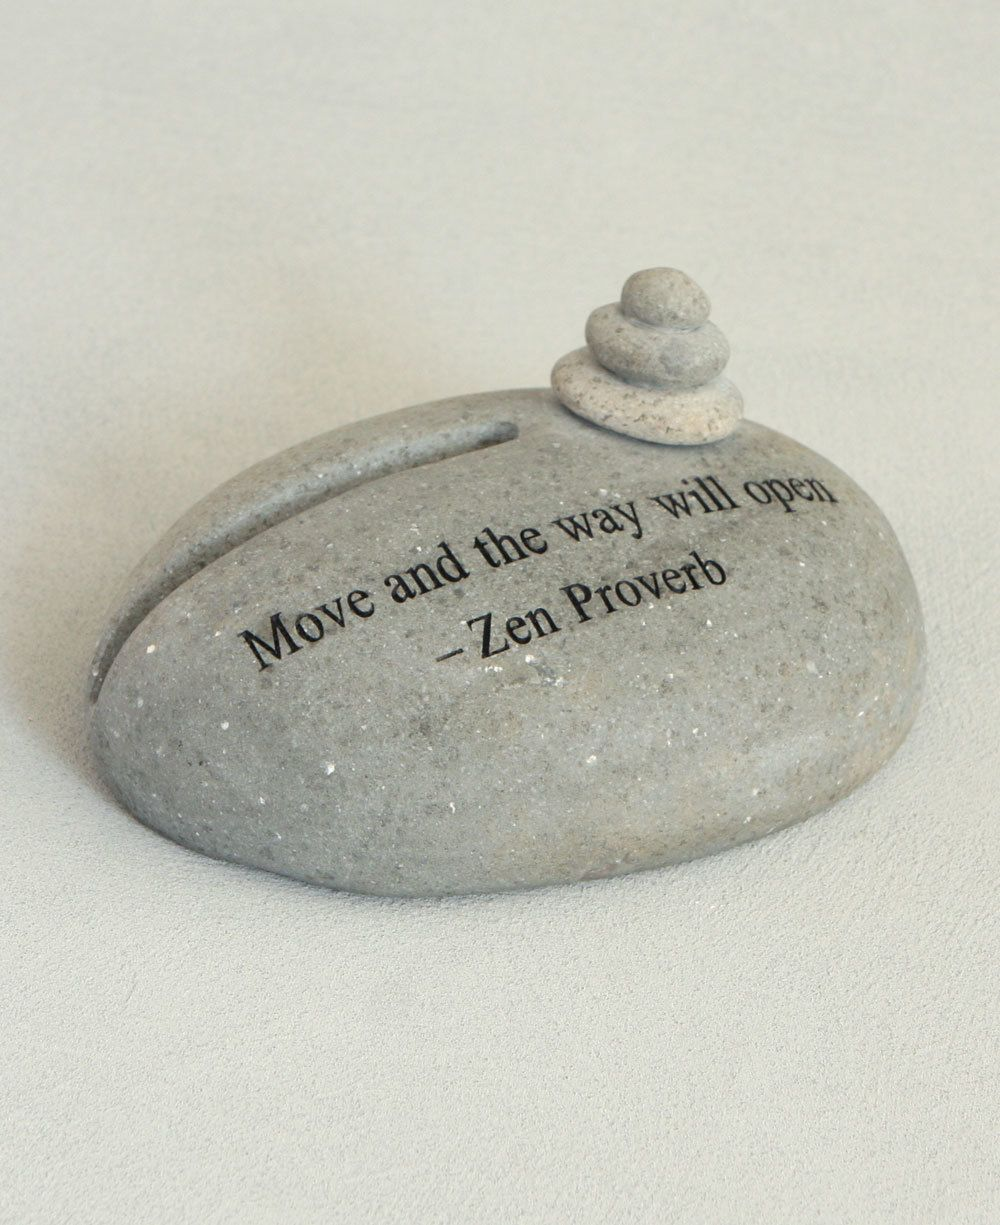 Zen proverb stone cairn business card holder gifts pinterest zen proverb stone cairn business card holder reheart Gallery